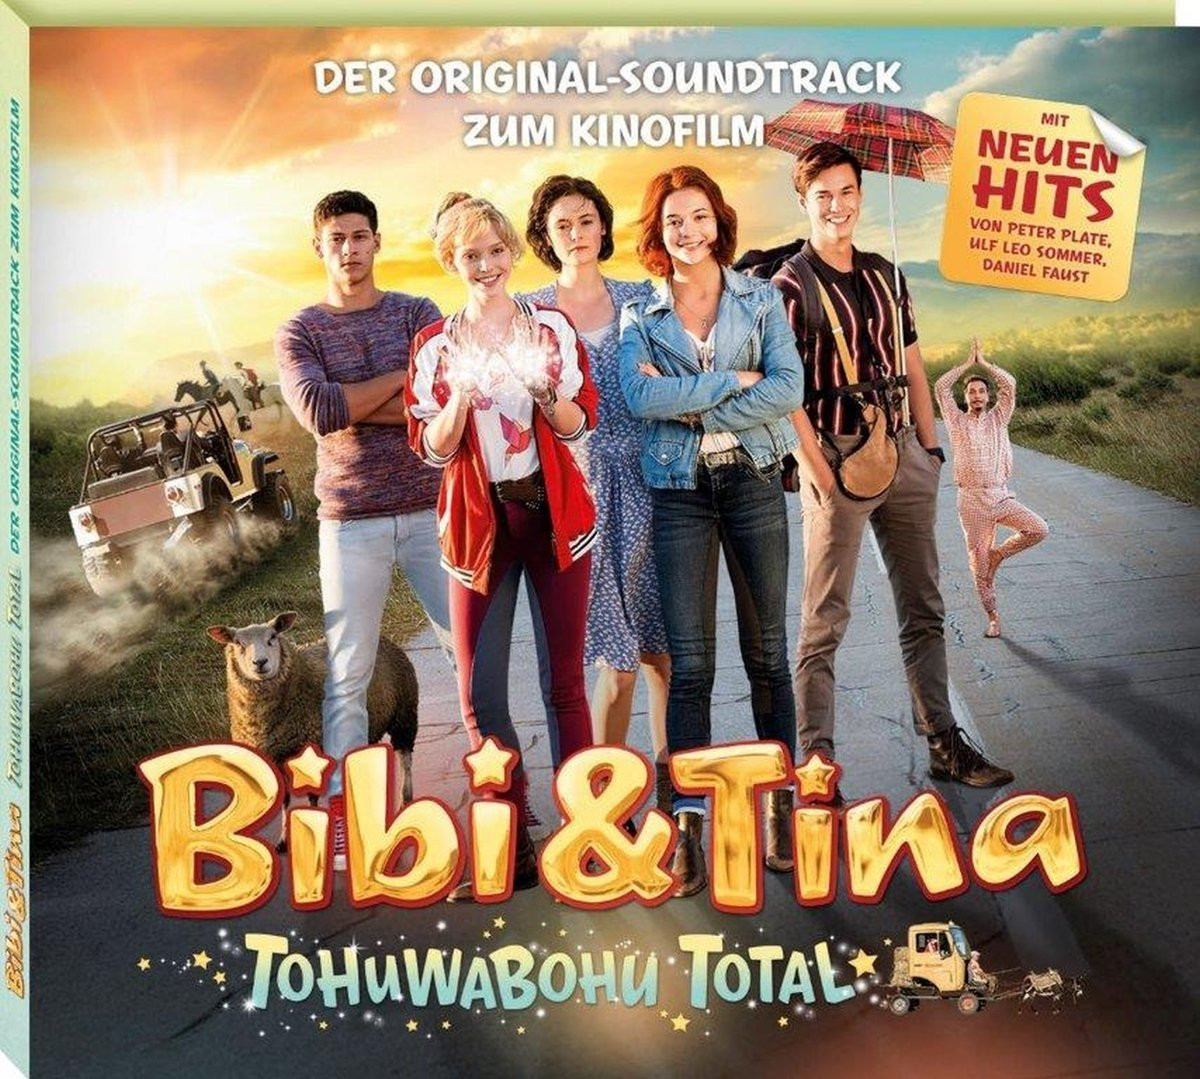 Bibi und Tina - Original Soundtrack zum 4.Kinofilm: Tohuwabohu Total